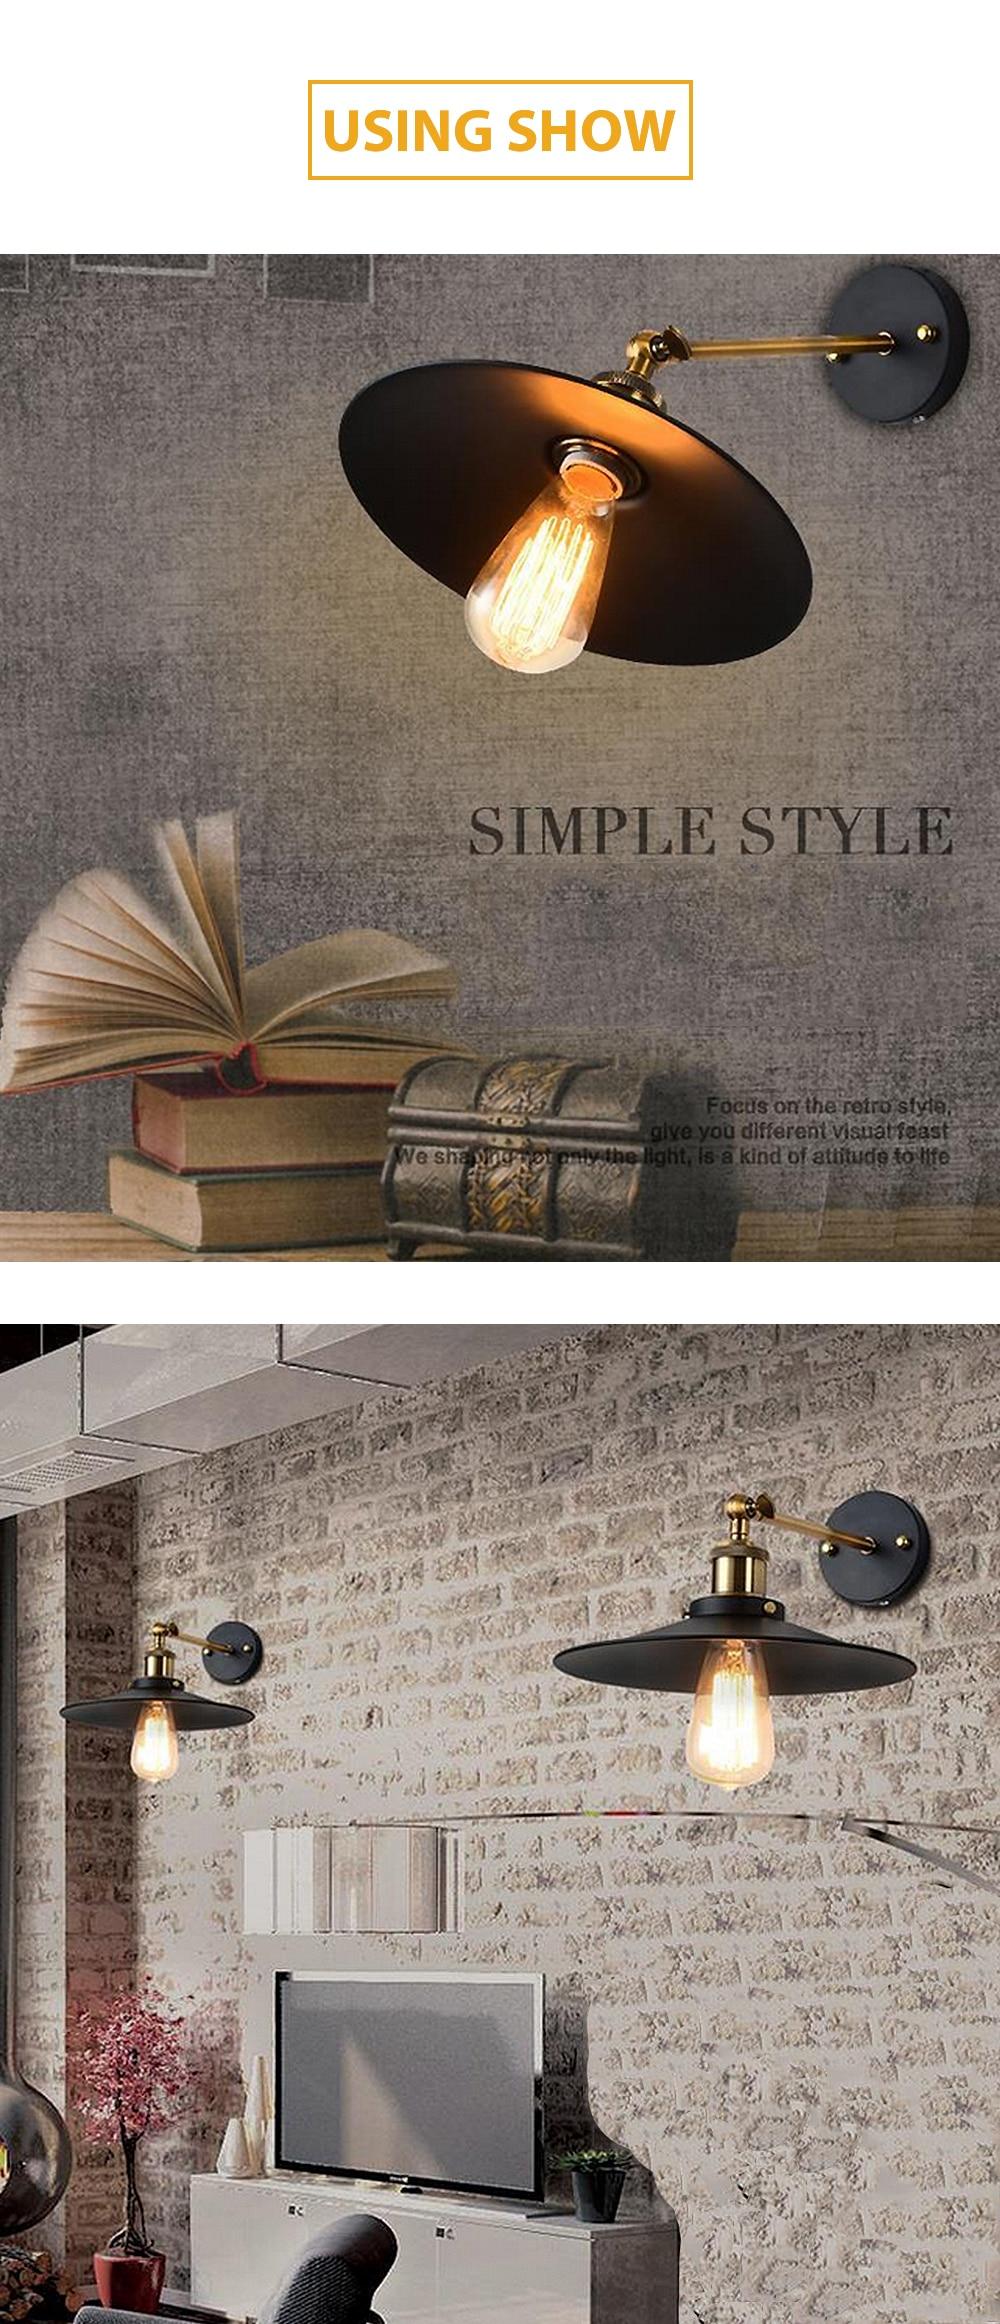 Led Vintage Ascelina El Loft Hogar Lámpara De Industrial Pared Para 3jLq54RcA